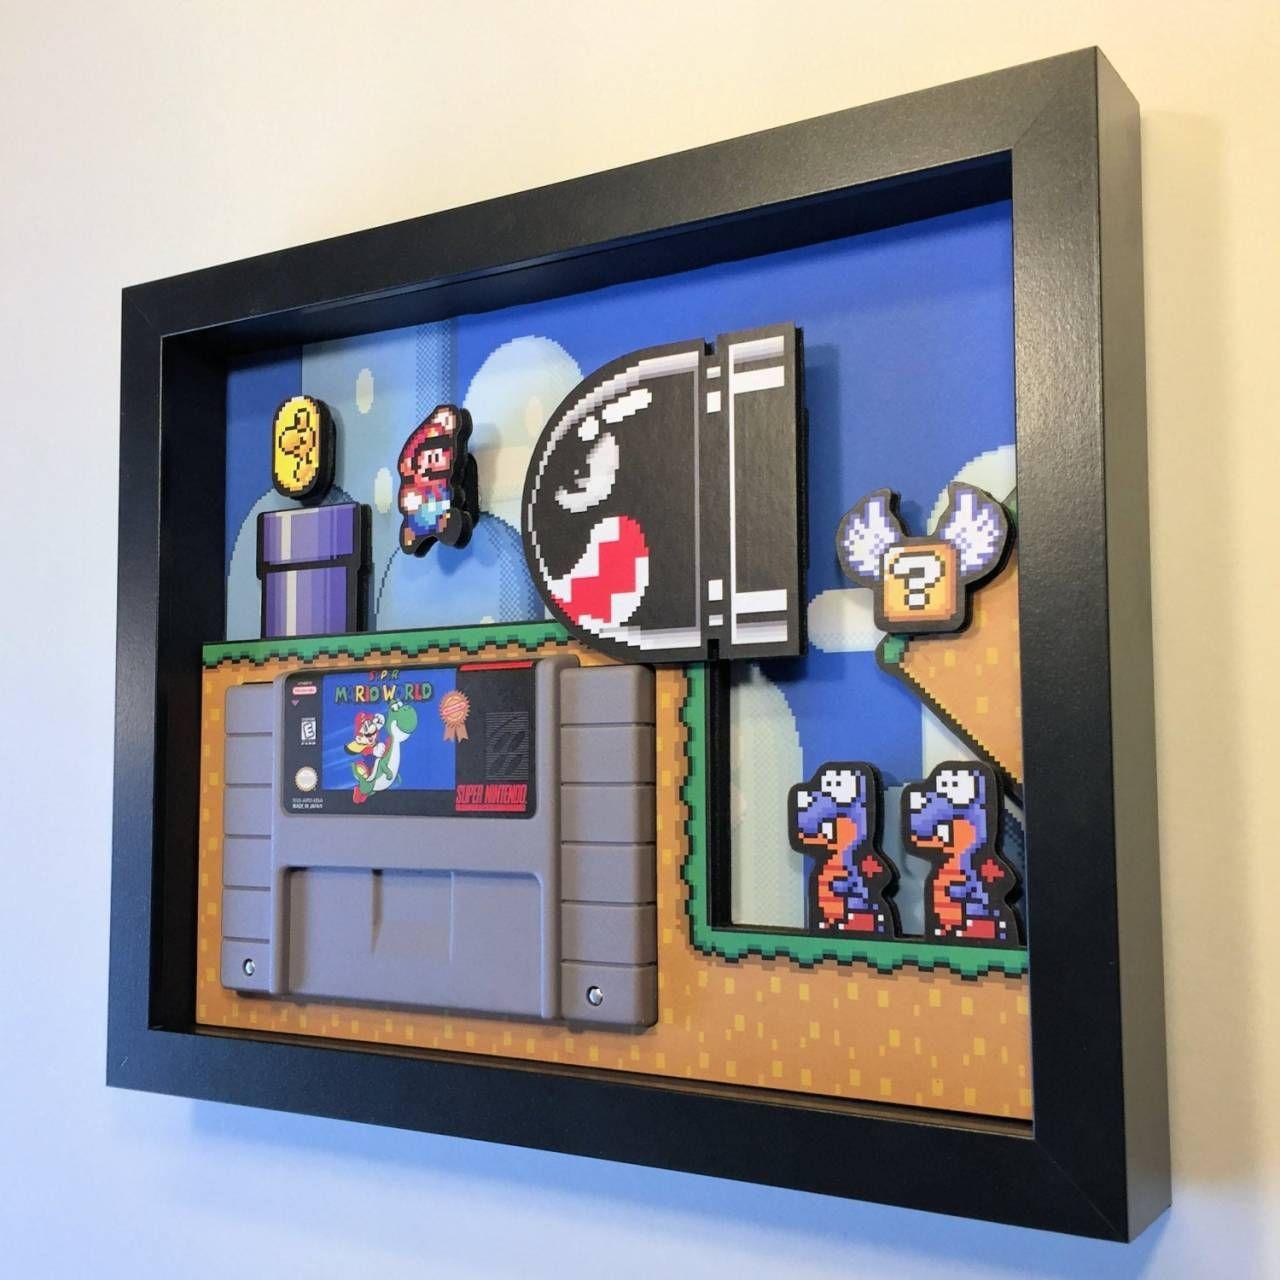 Super Nintendo Cartridge Displays made by GlitchArtwork -